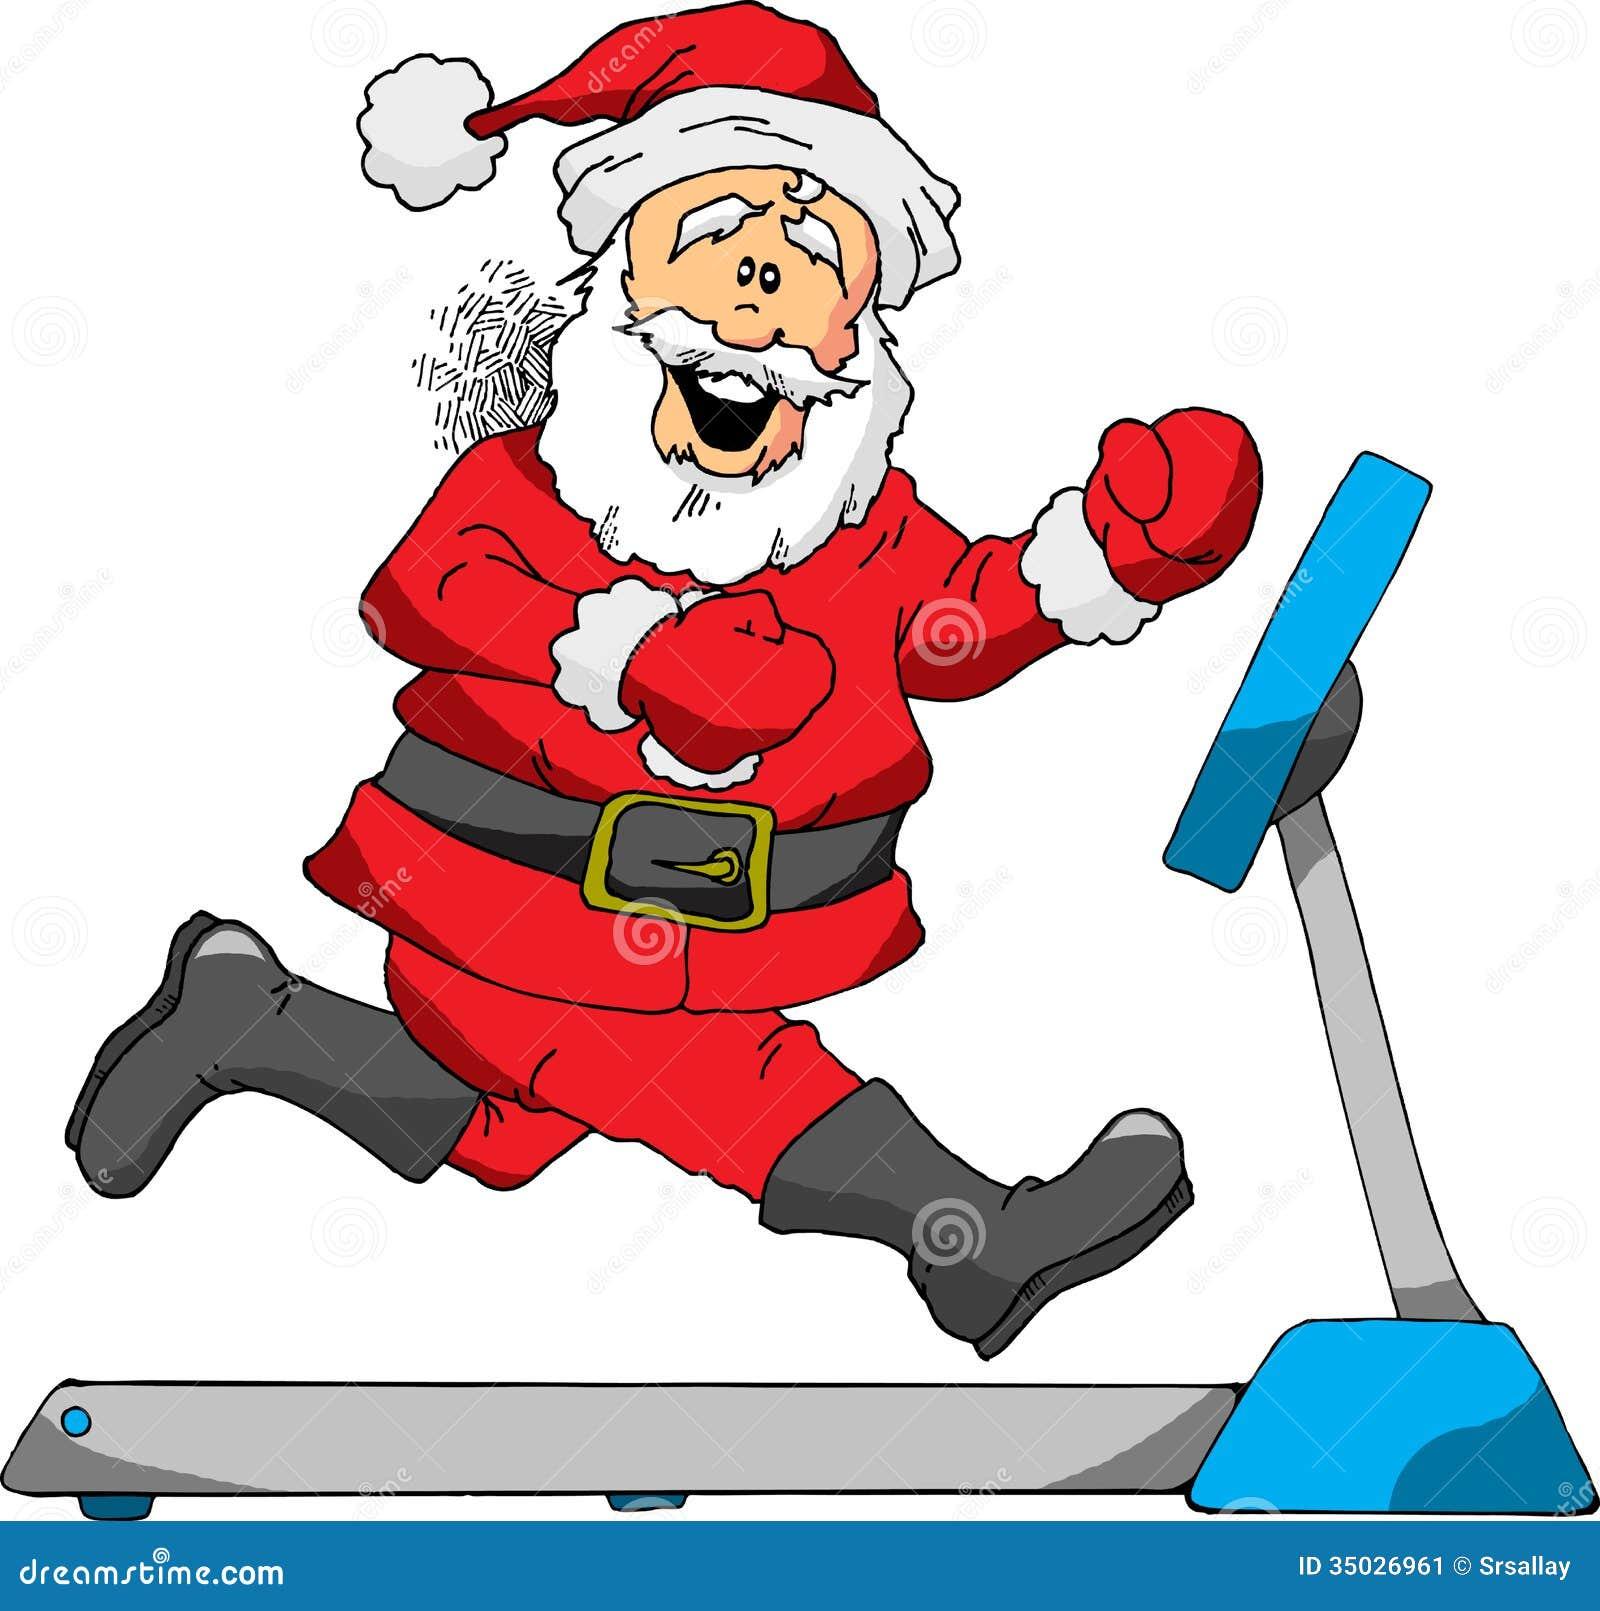 Displaying 19 gt  Images For - Cartoon Treadmill   Santa Jogging